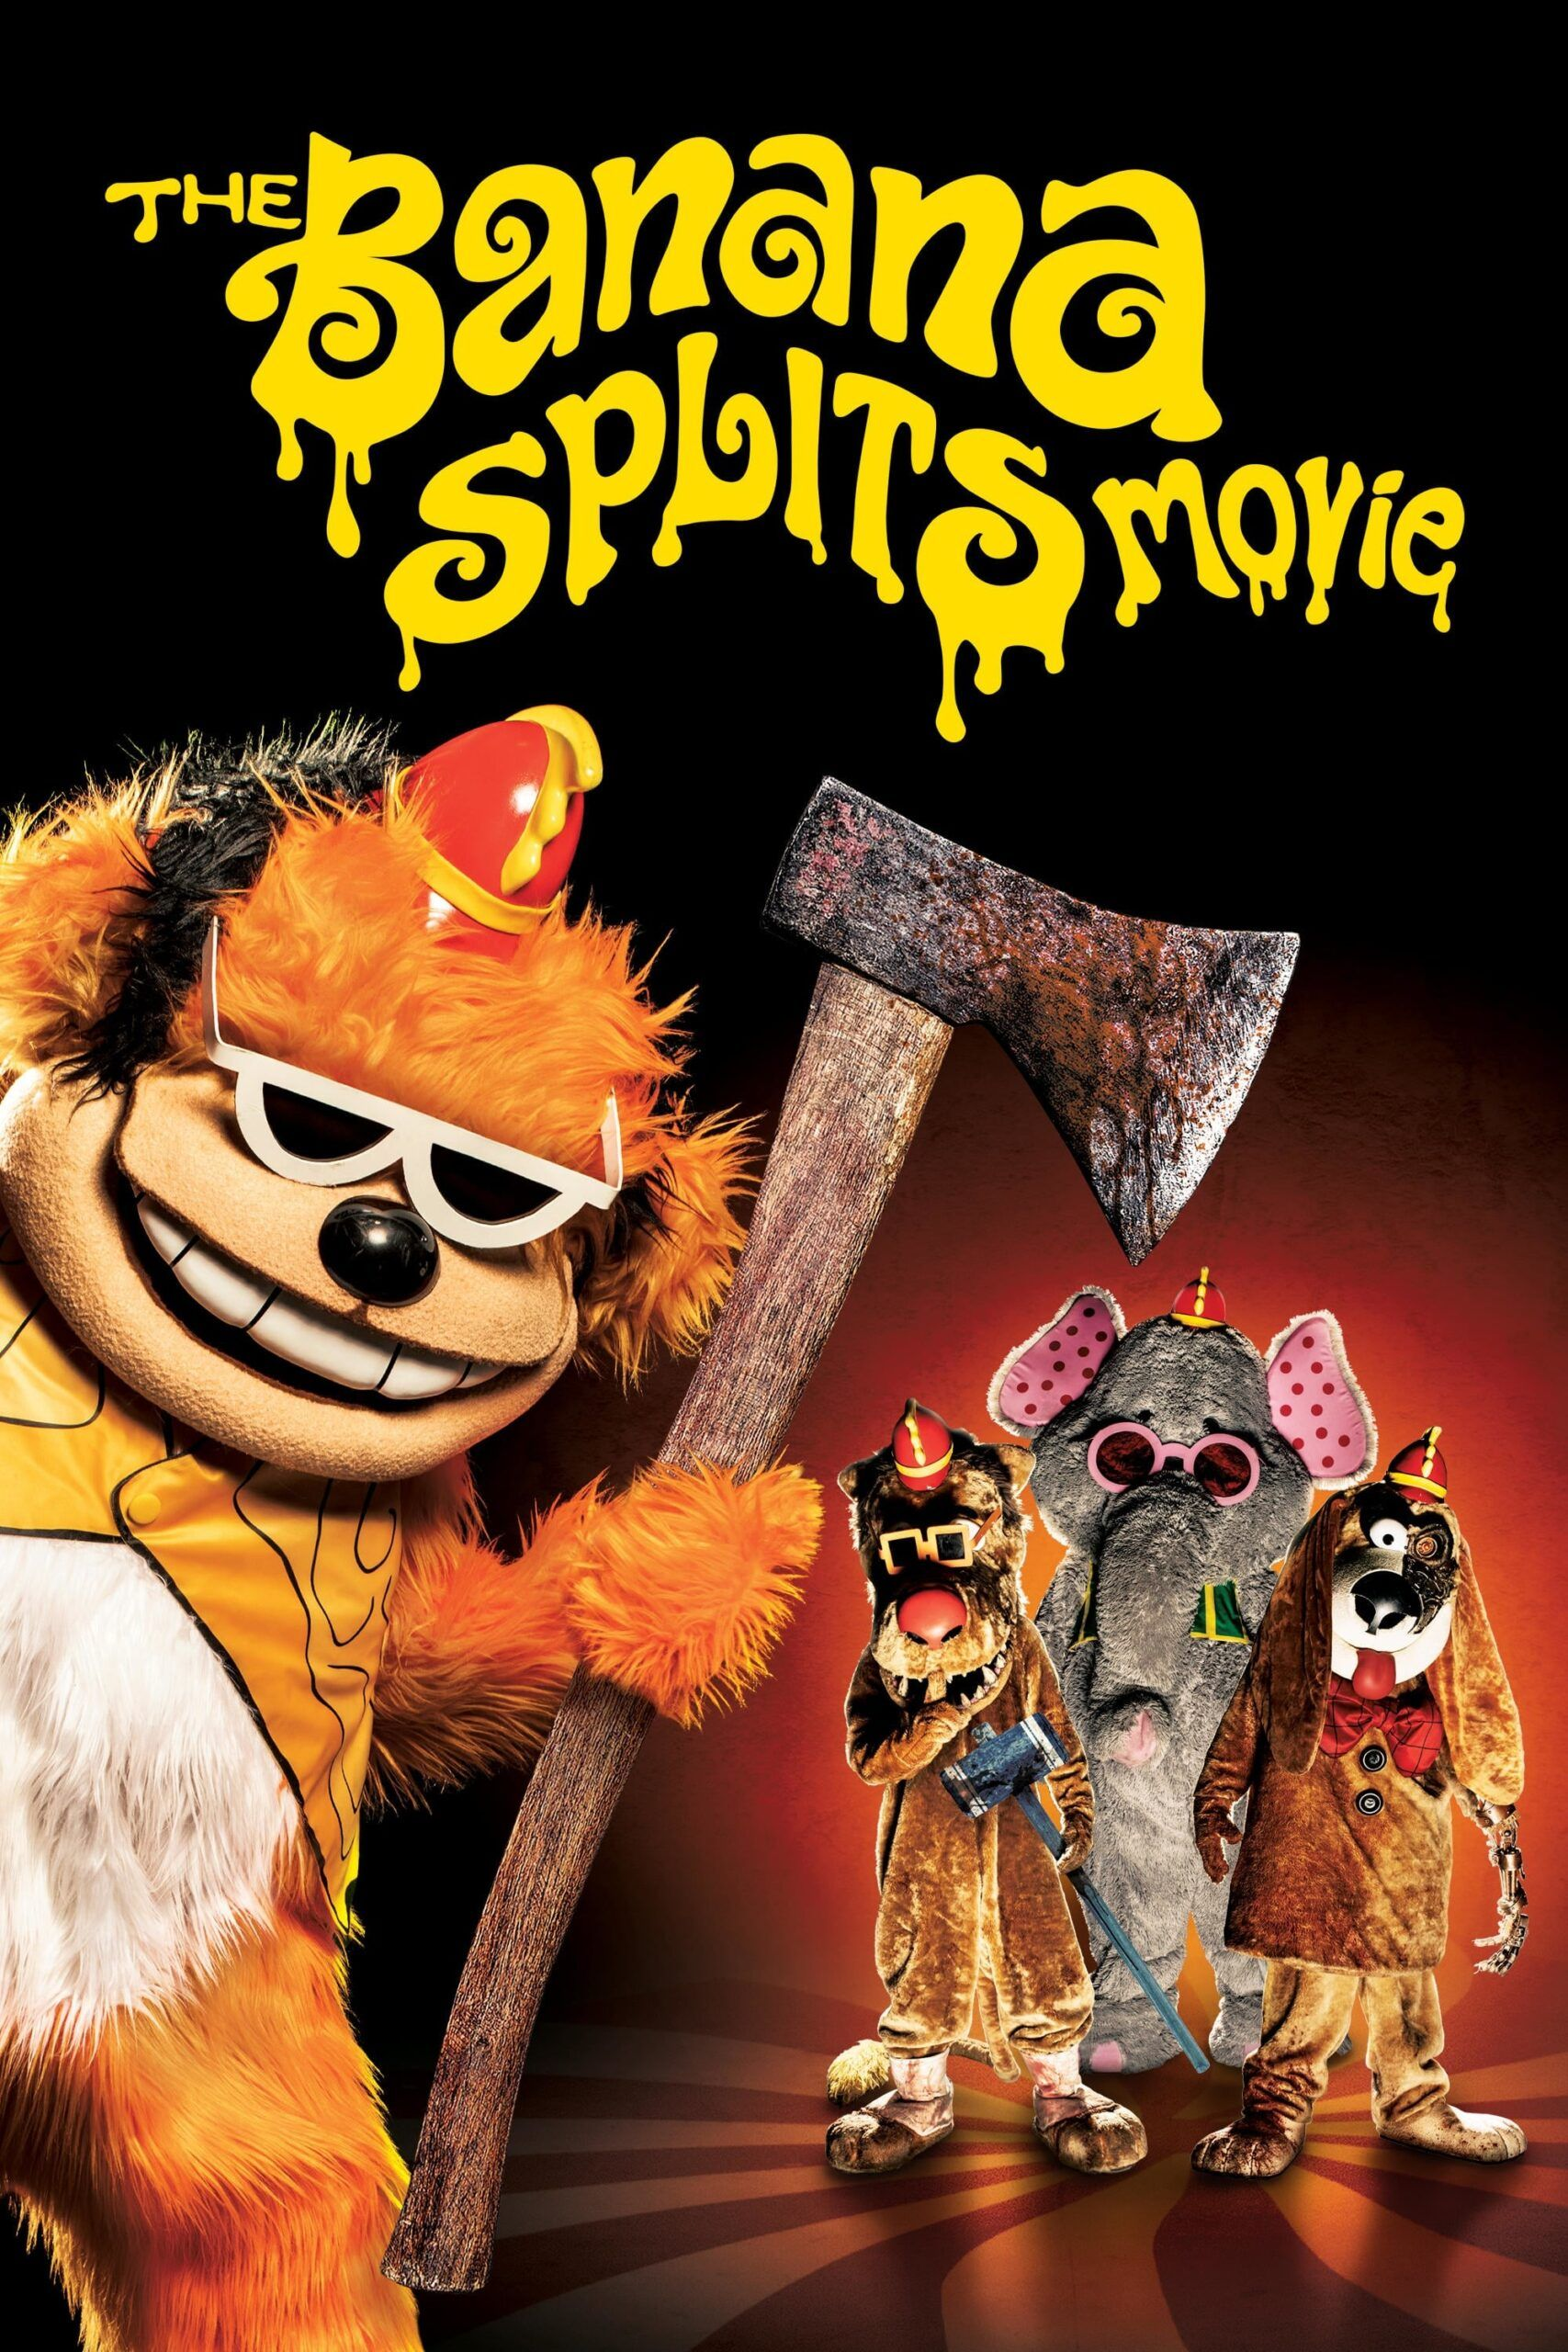 Horror Cb01 Events Film Gratis Hd Streaming E Download Ex Cineblog01 Banana Split Film Horror Film Completi